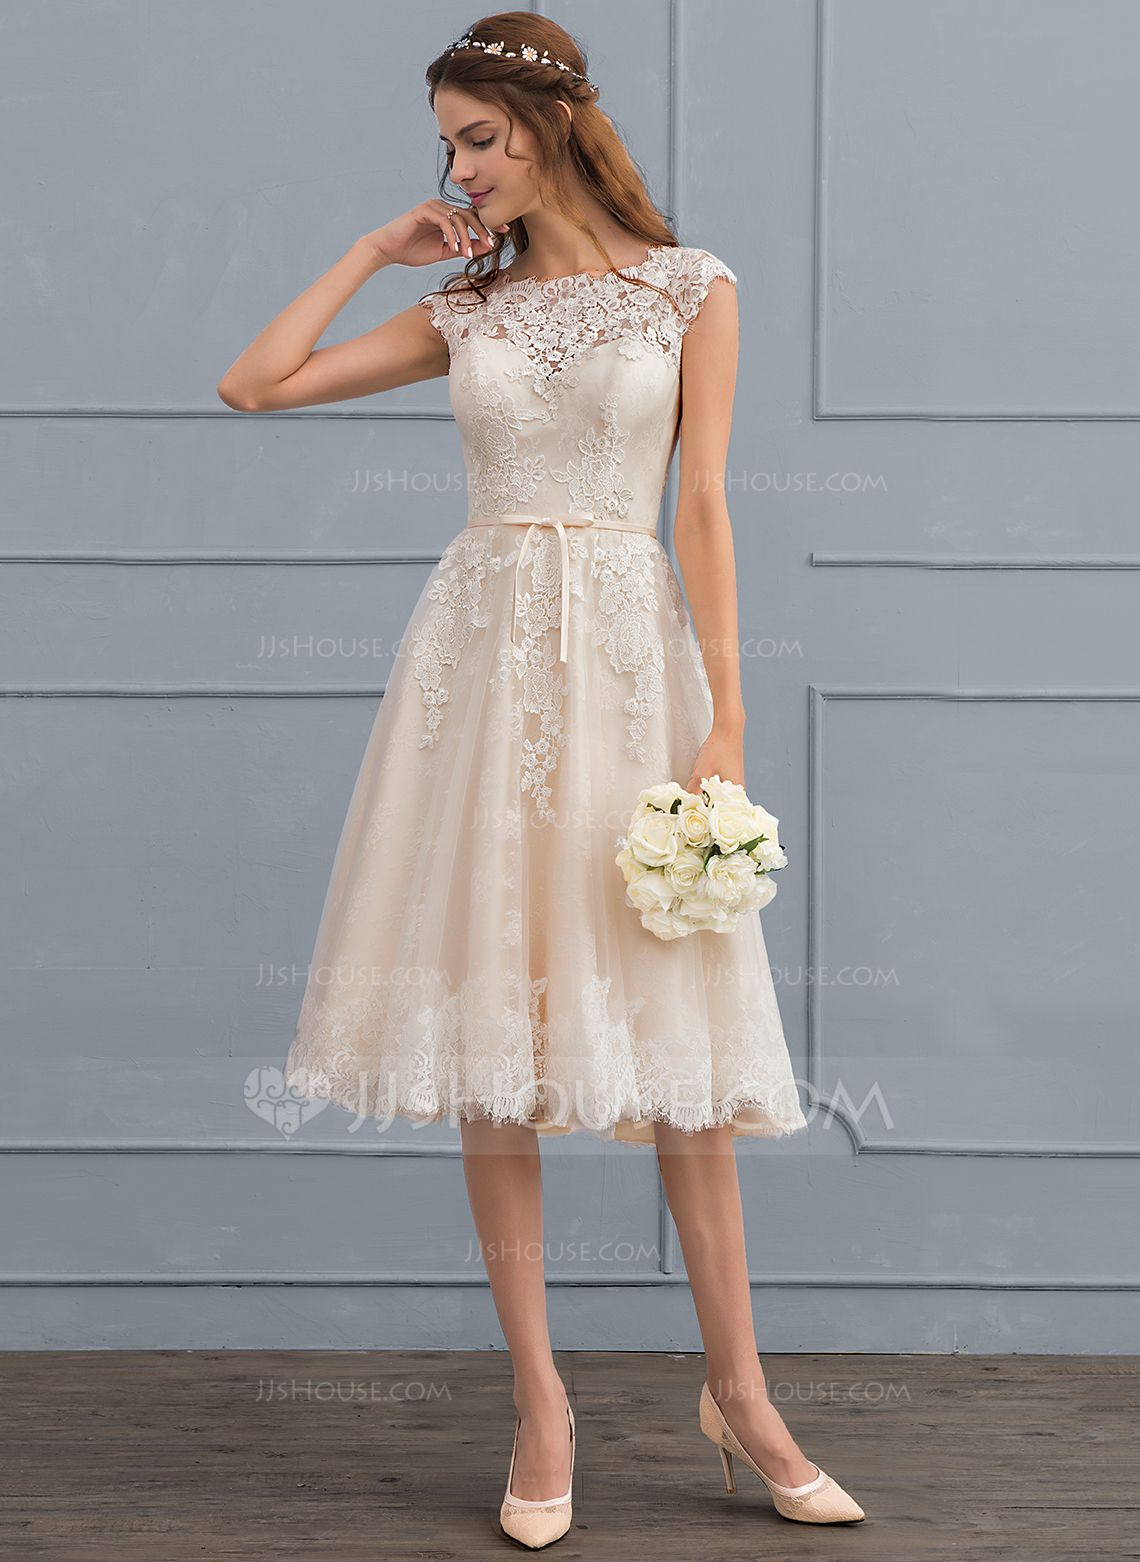 Unique Winter Wedding Dresses Under $1500 | Lace dress, Rehearsal ...